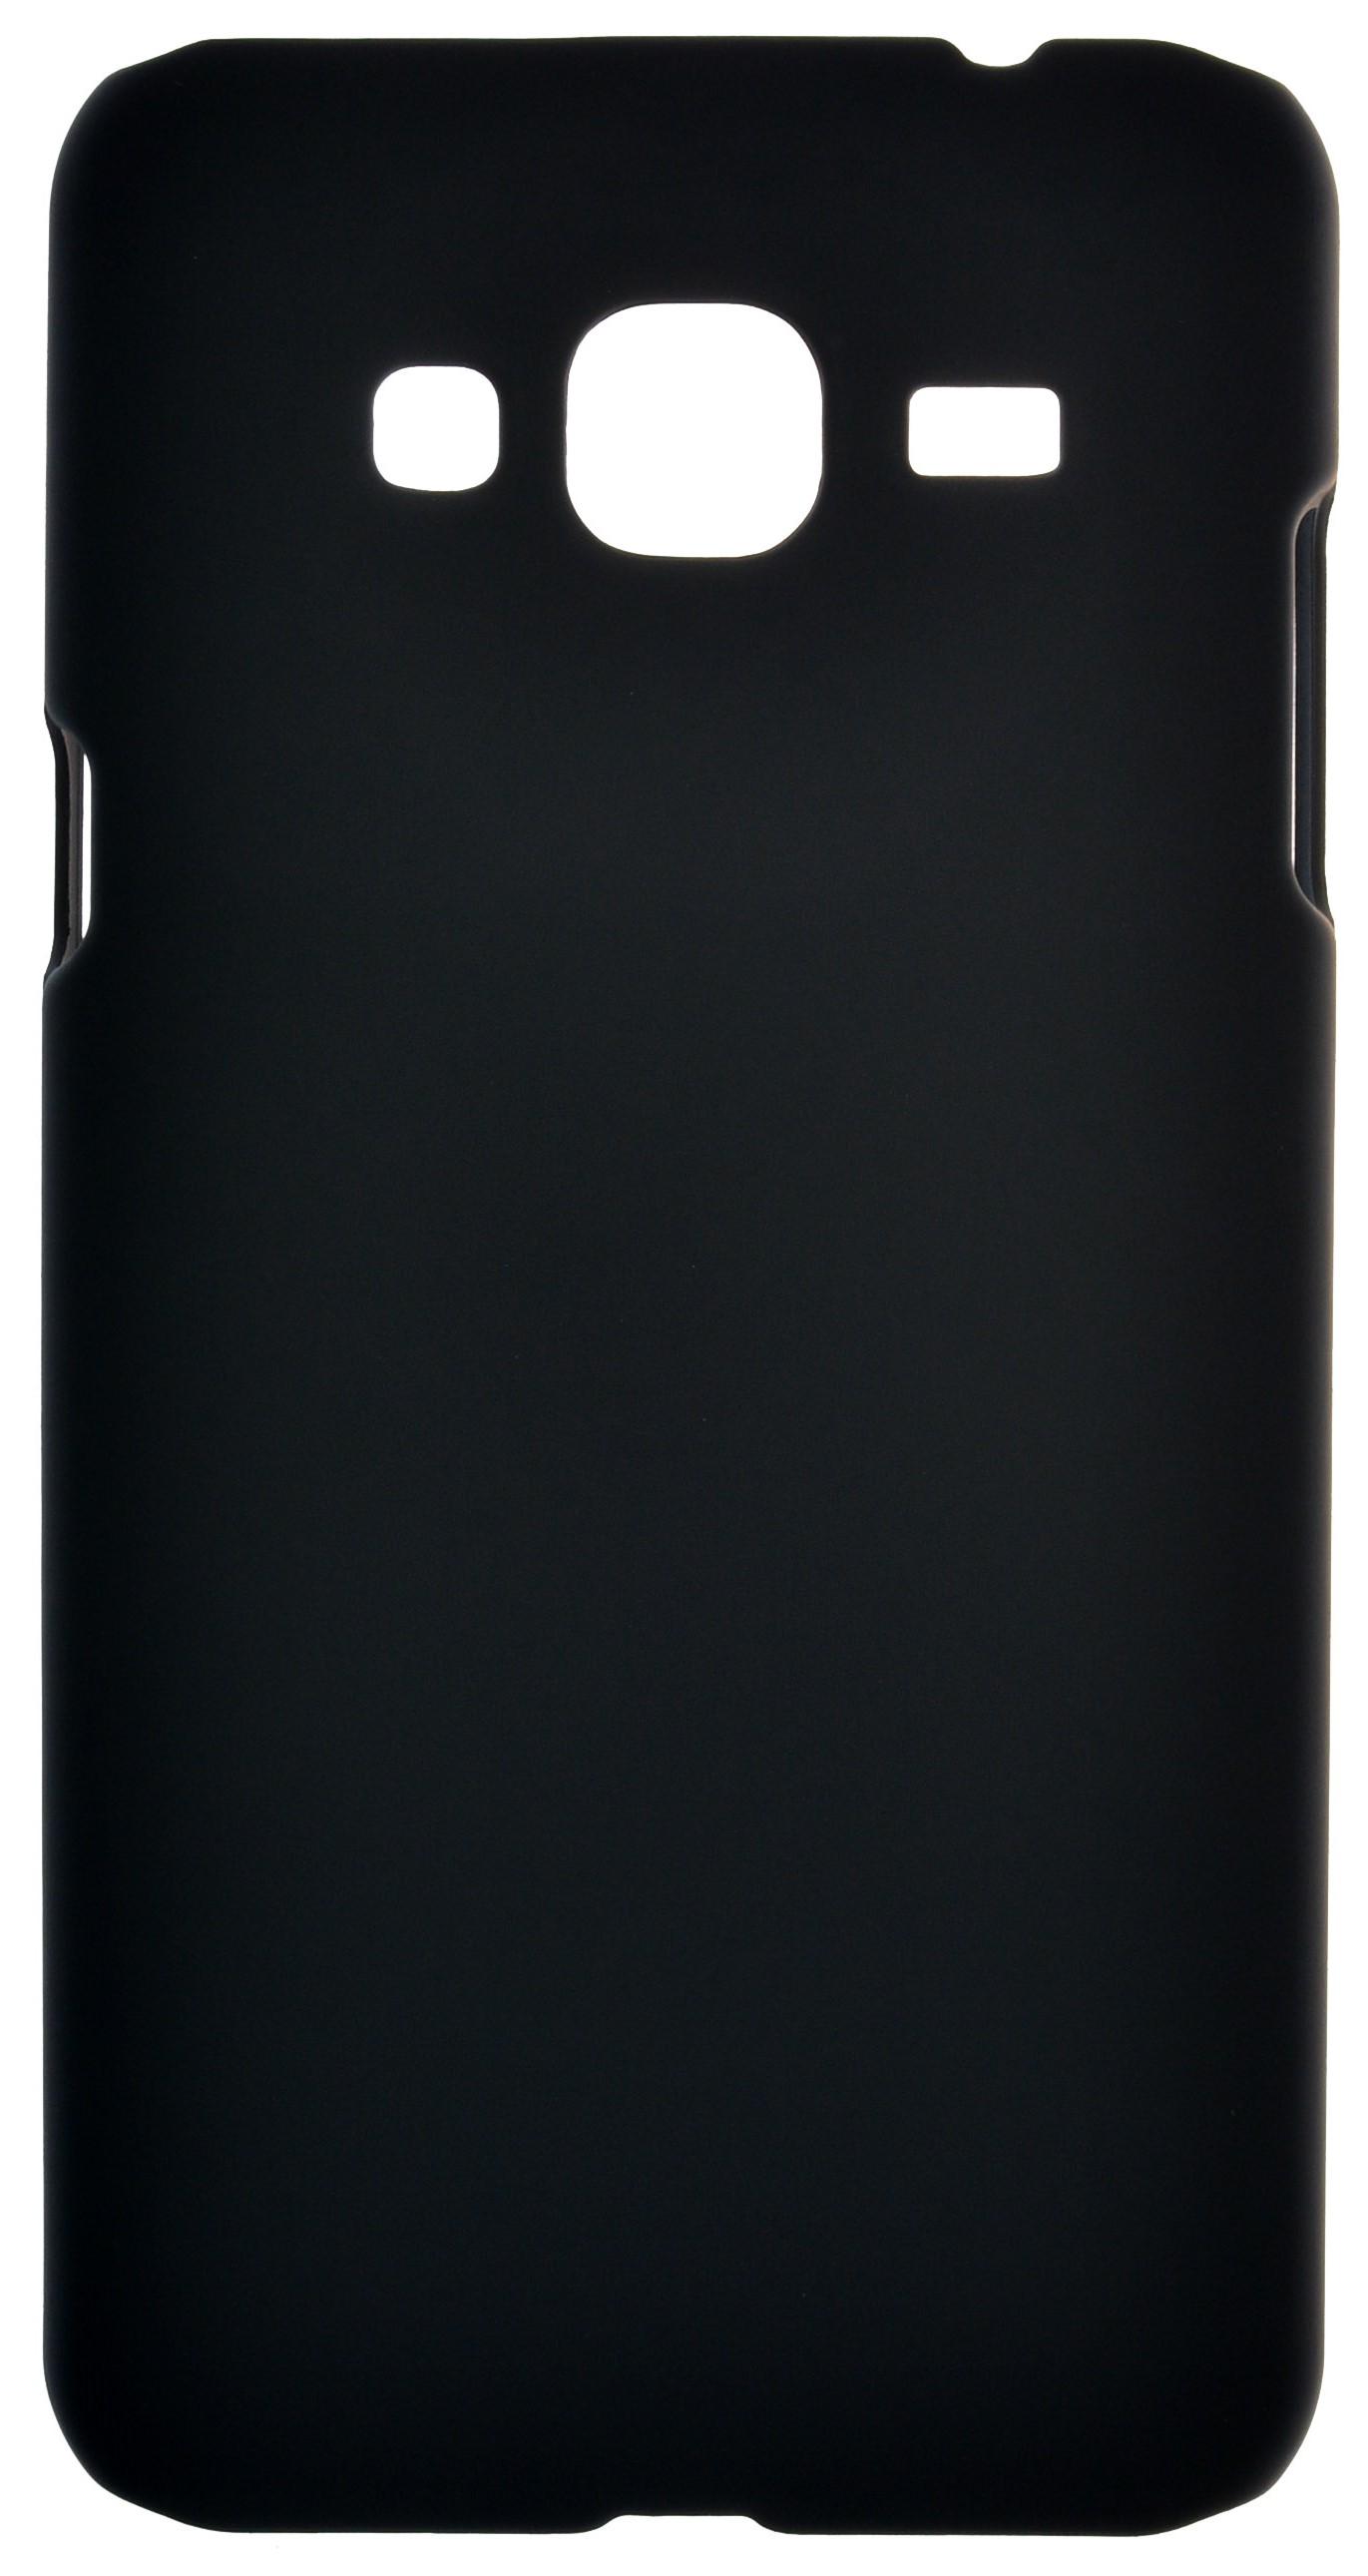 Чехол skinBOX 4People case для Samsung Galaxy J3 (2016) SM-J320F, черный